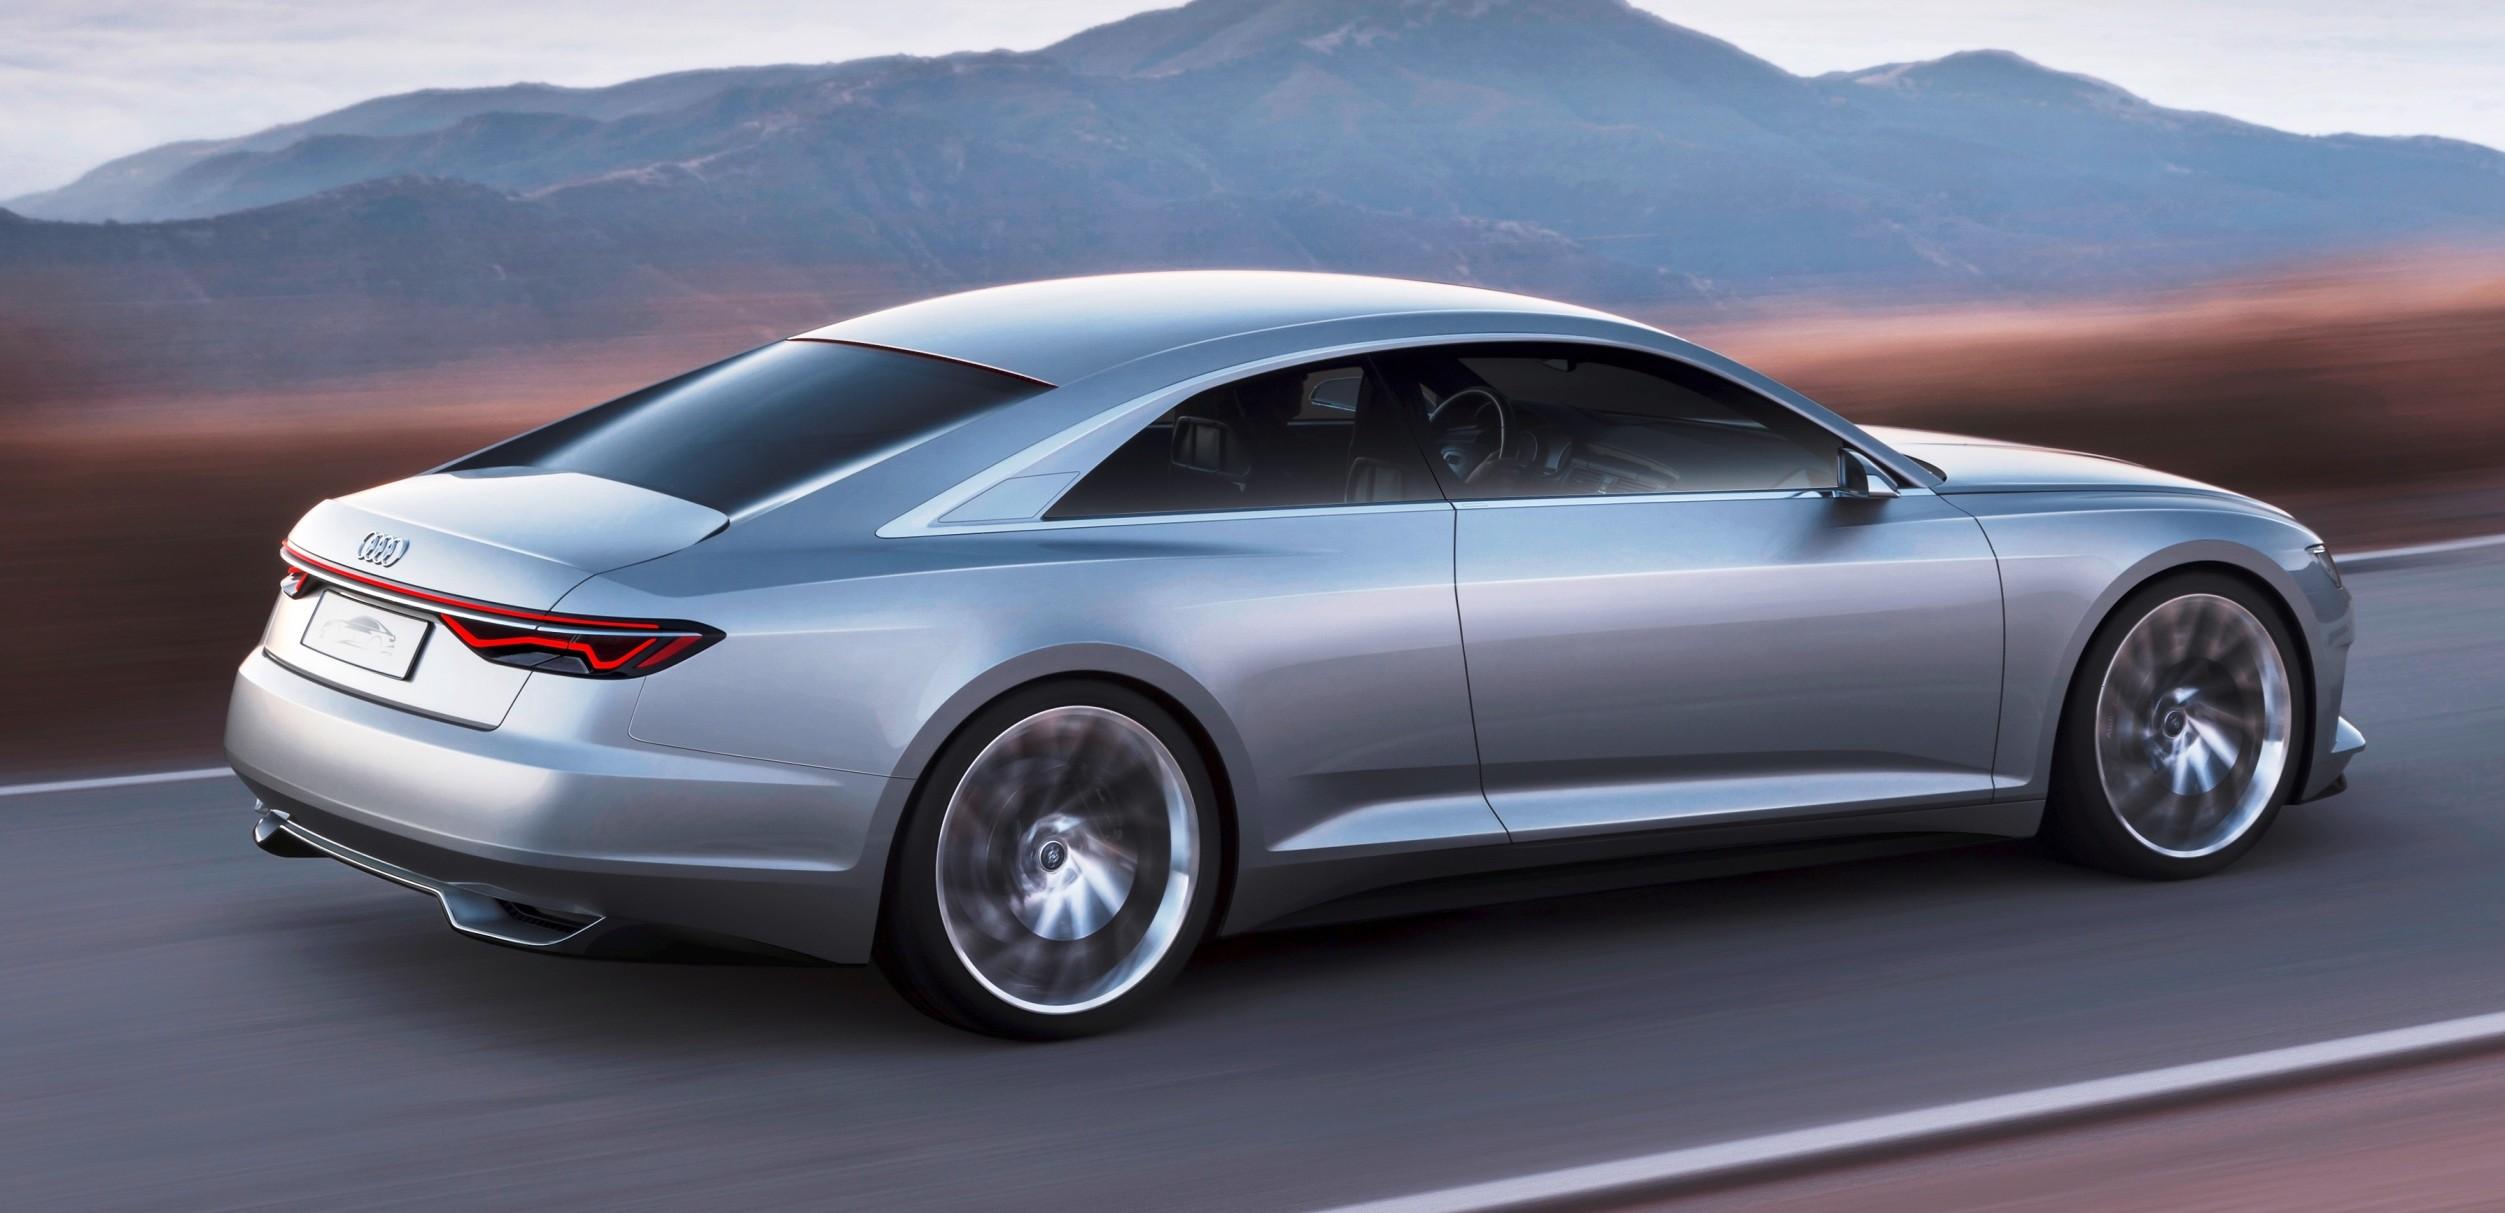 2014 Audi Prologue is Worst of LA 2014 27